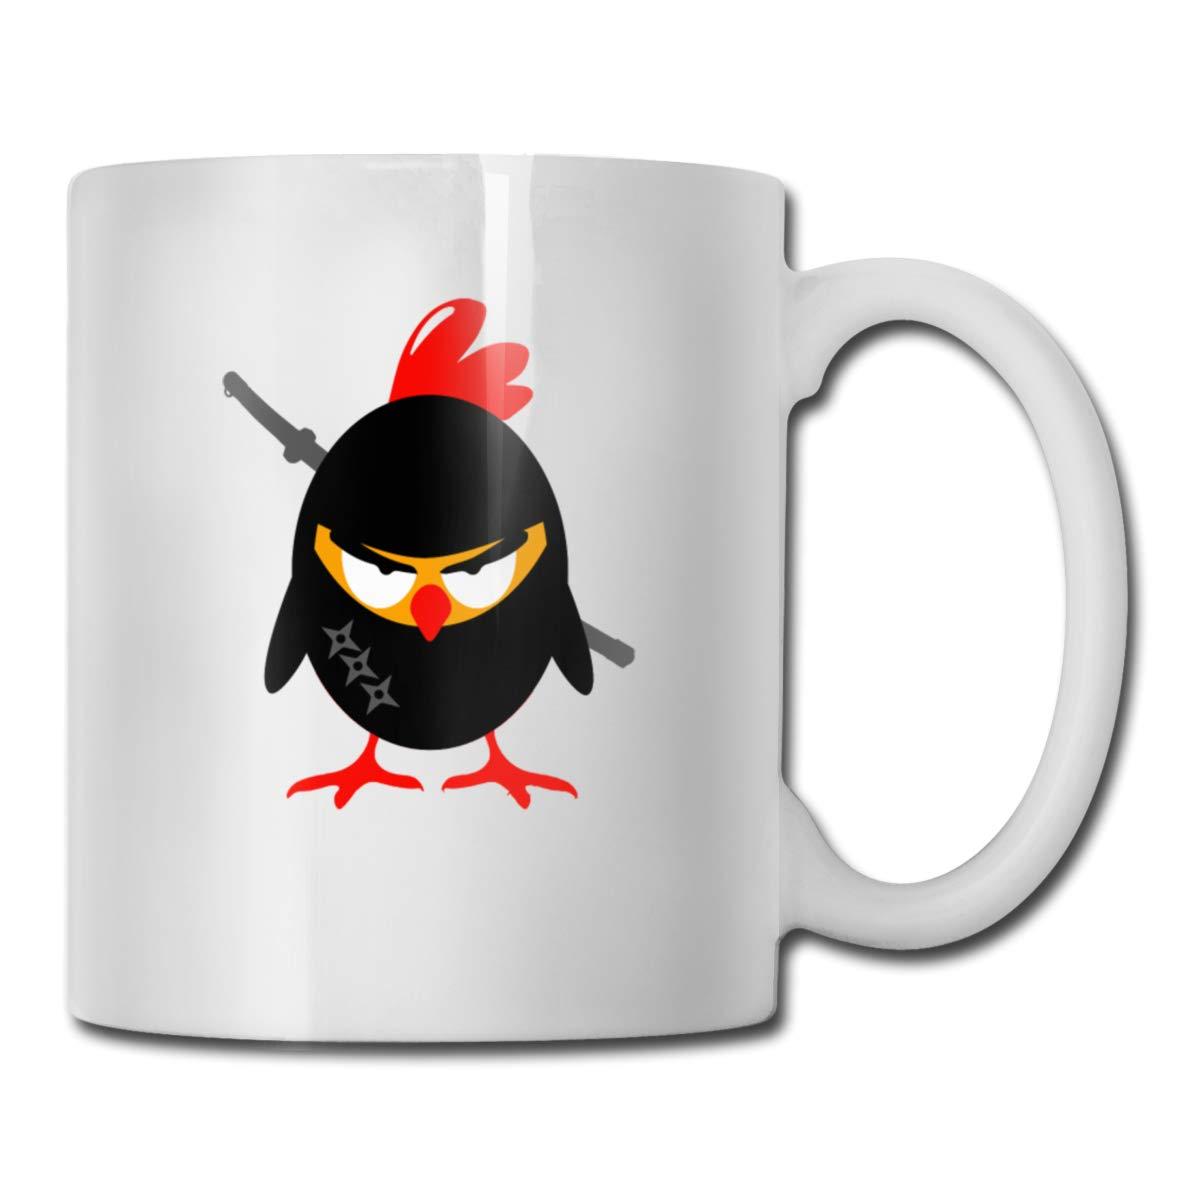 Amazon.com: Riokk Az an Angry Ninja Fried Chicken Carrying A ...